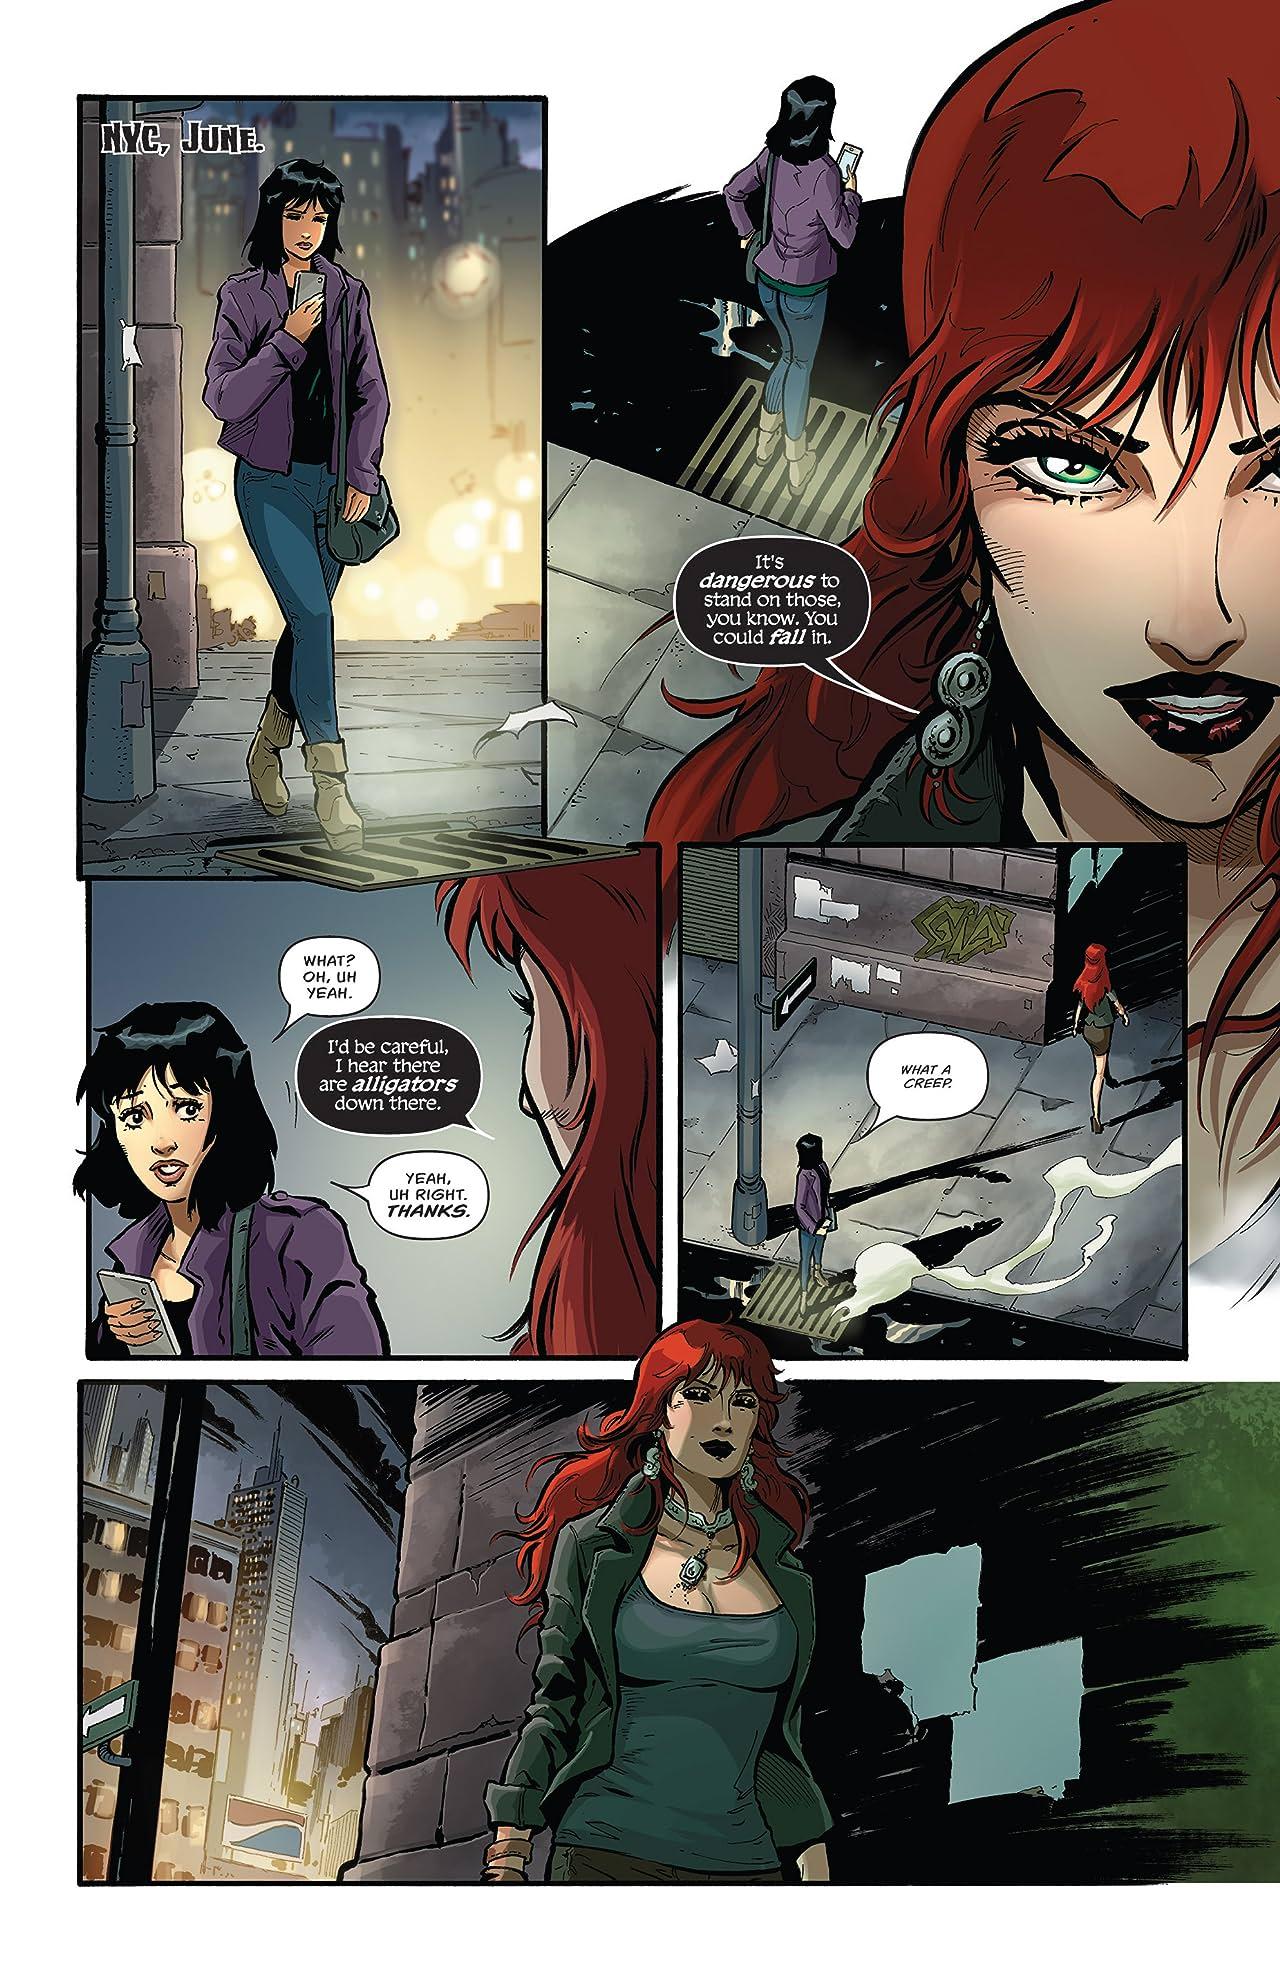 Grimm Tales of Terror Vol. 3 #6